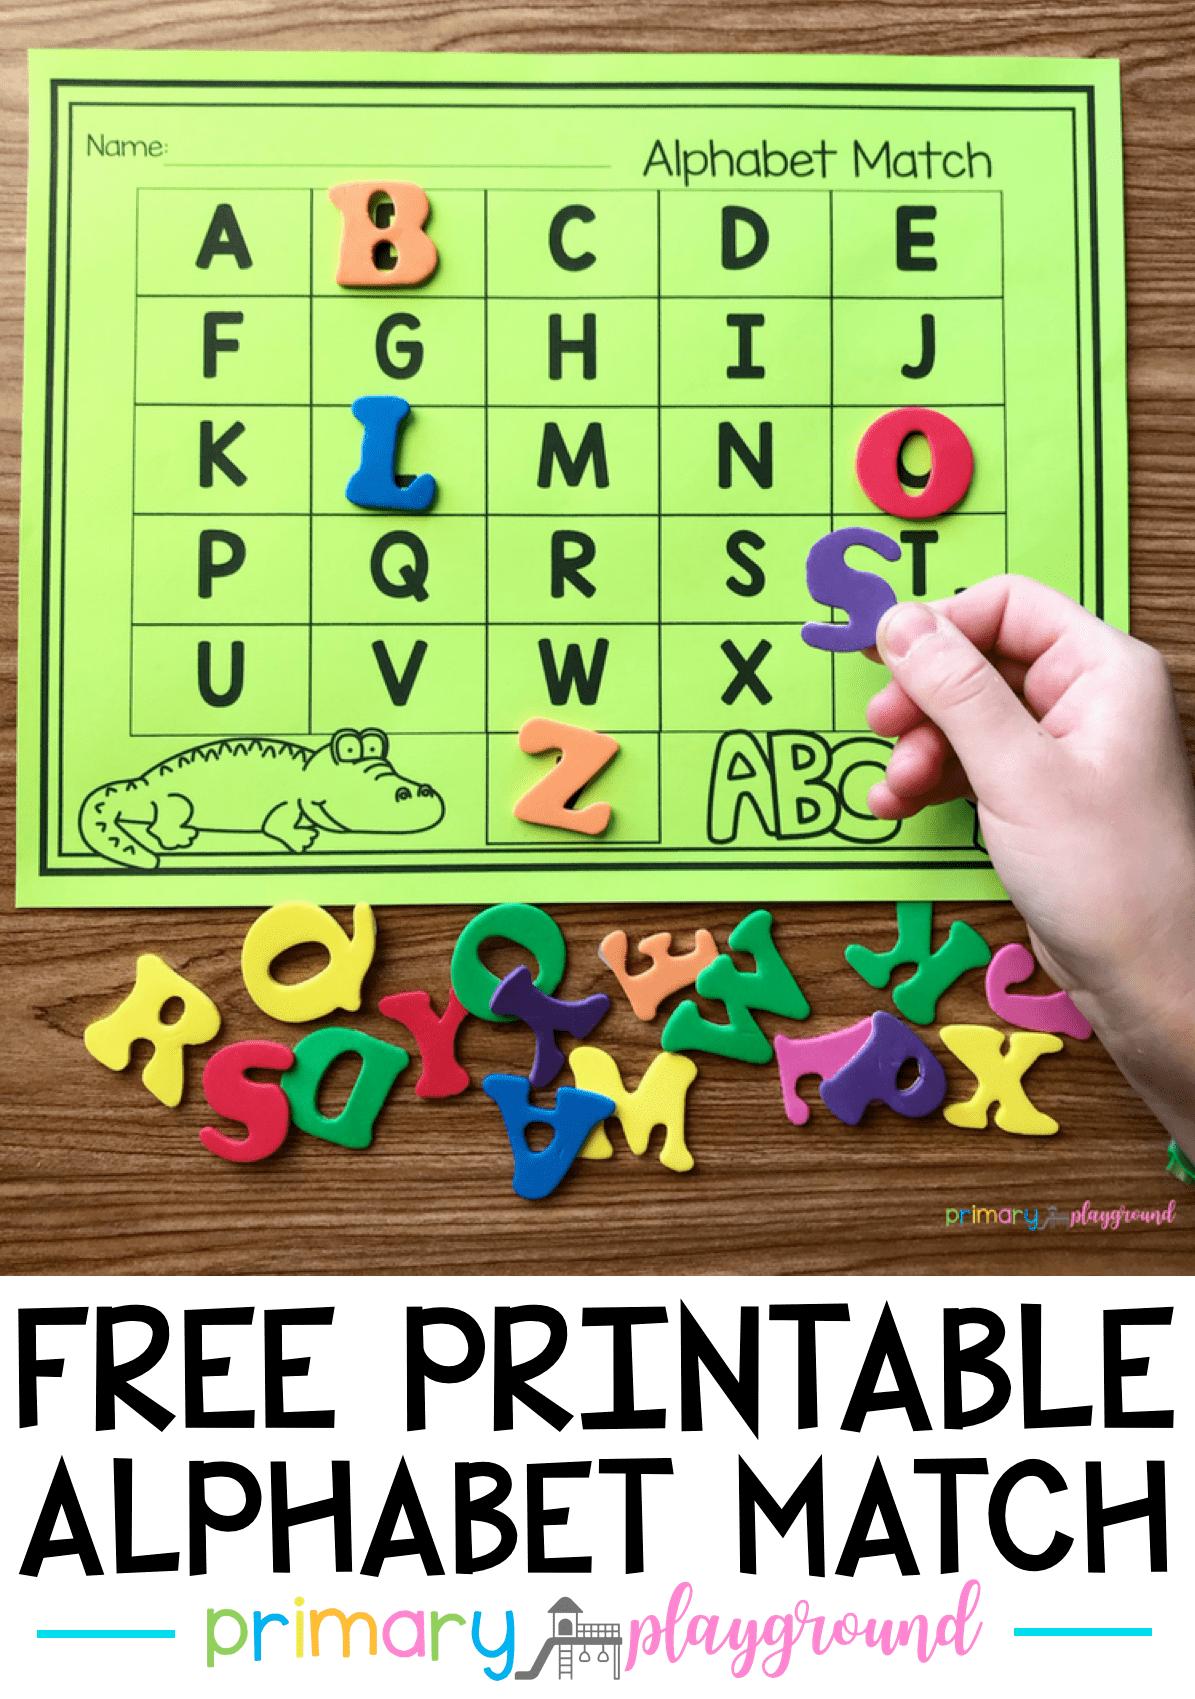 Free Printable Alphabet Match Primary Playground Preschool Letters Alphabet Kindergarten Alphabet Preschool [ 1699 x 1195 Pixel ]